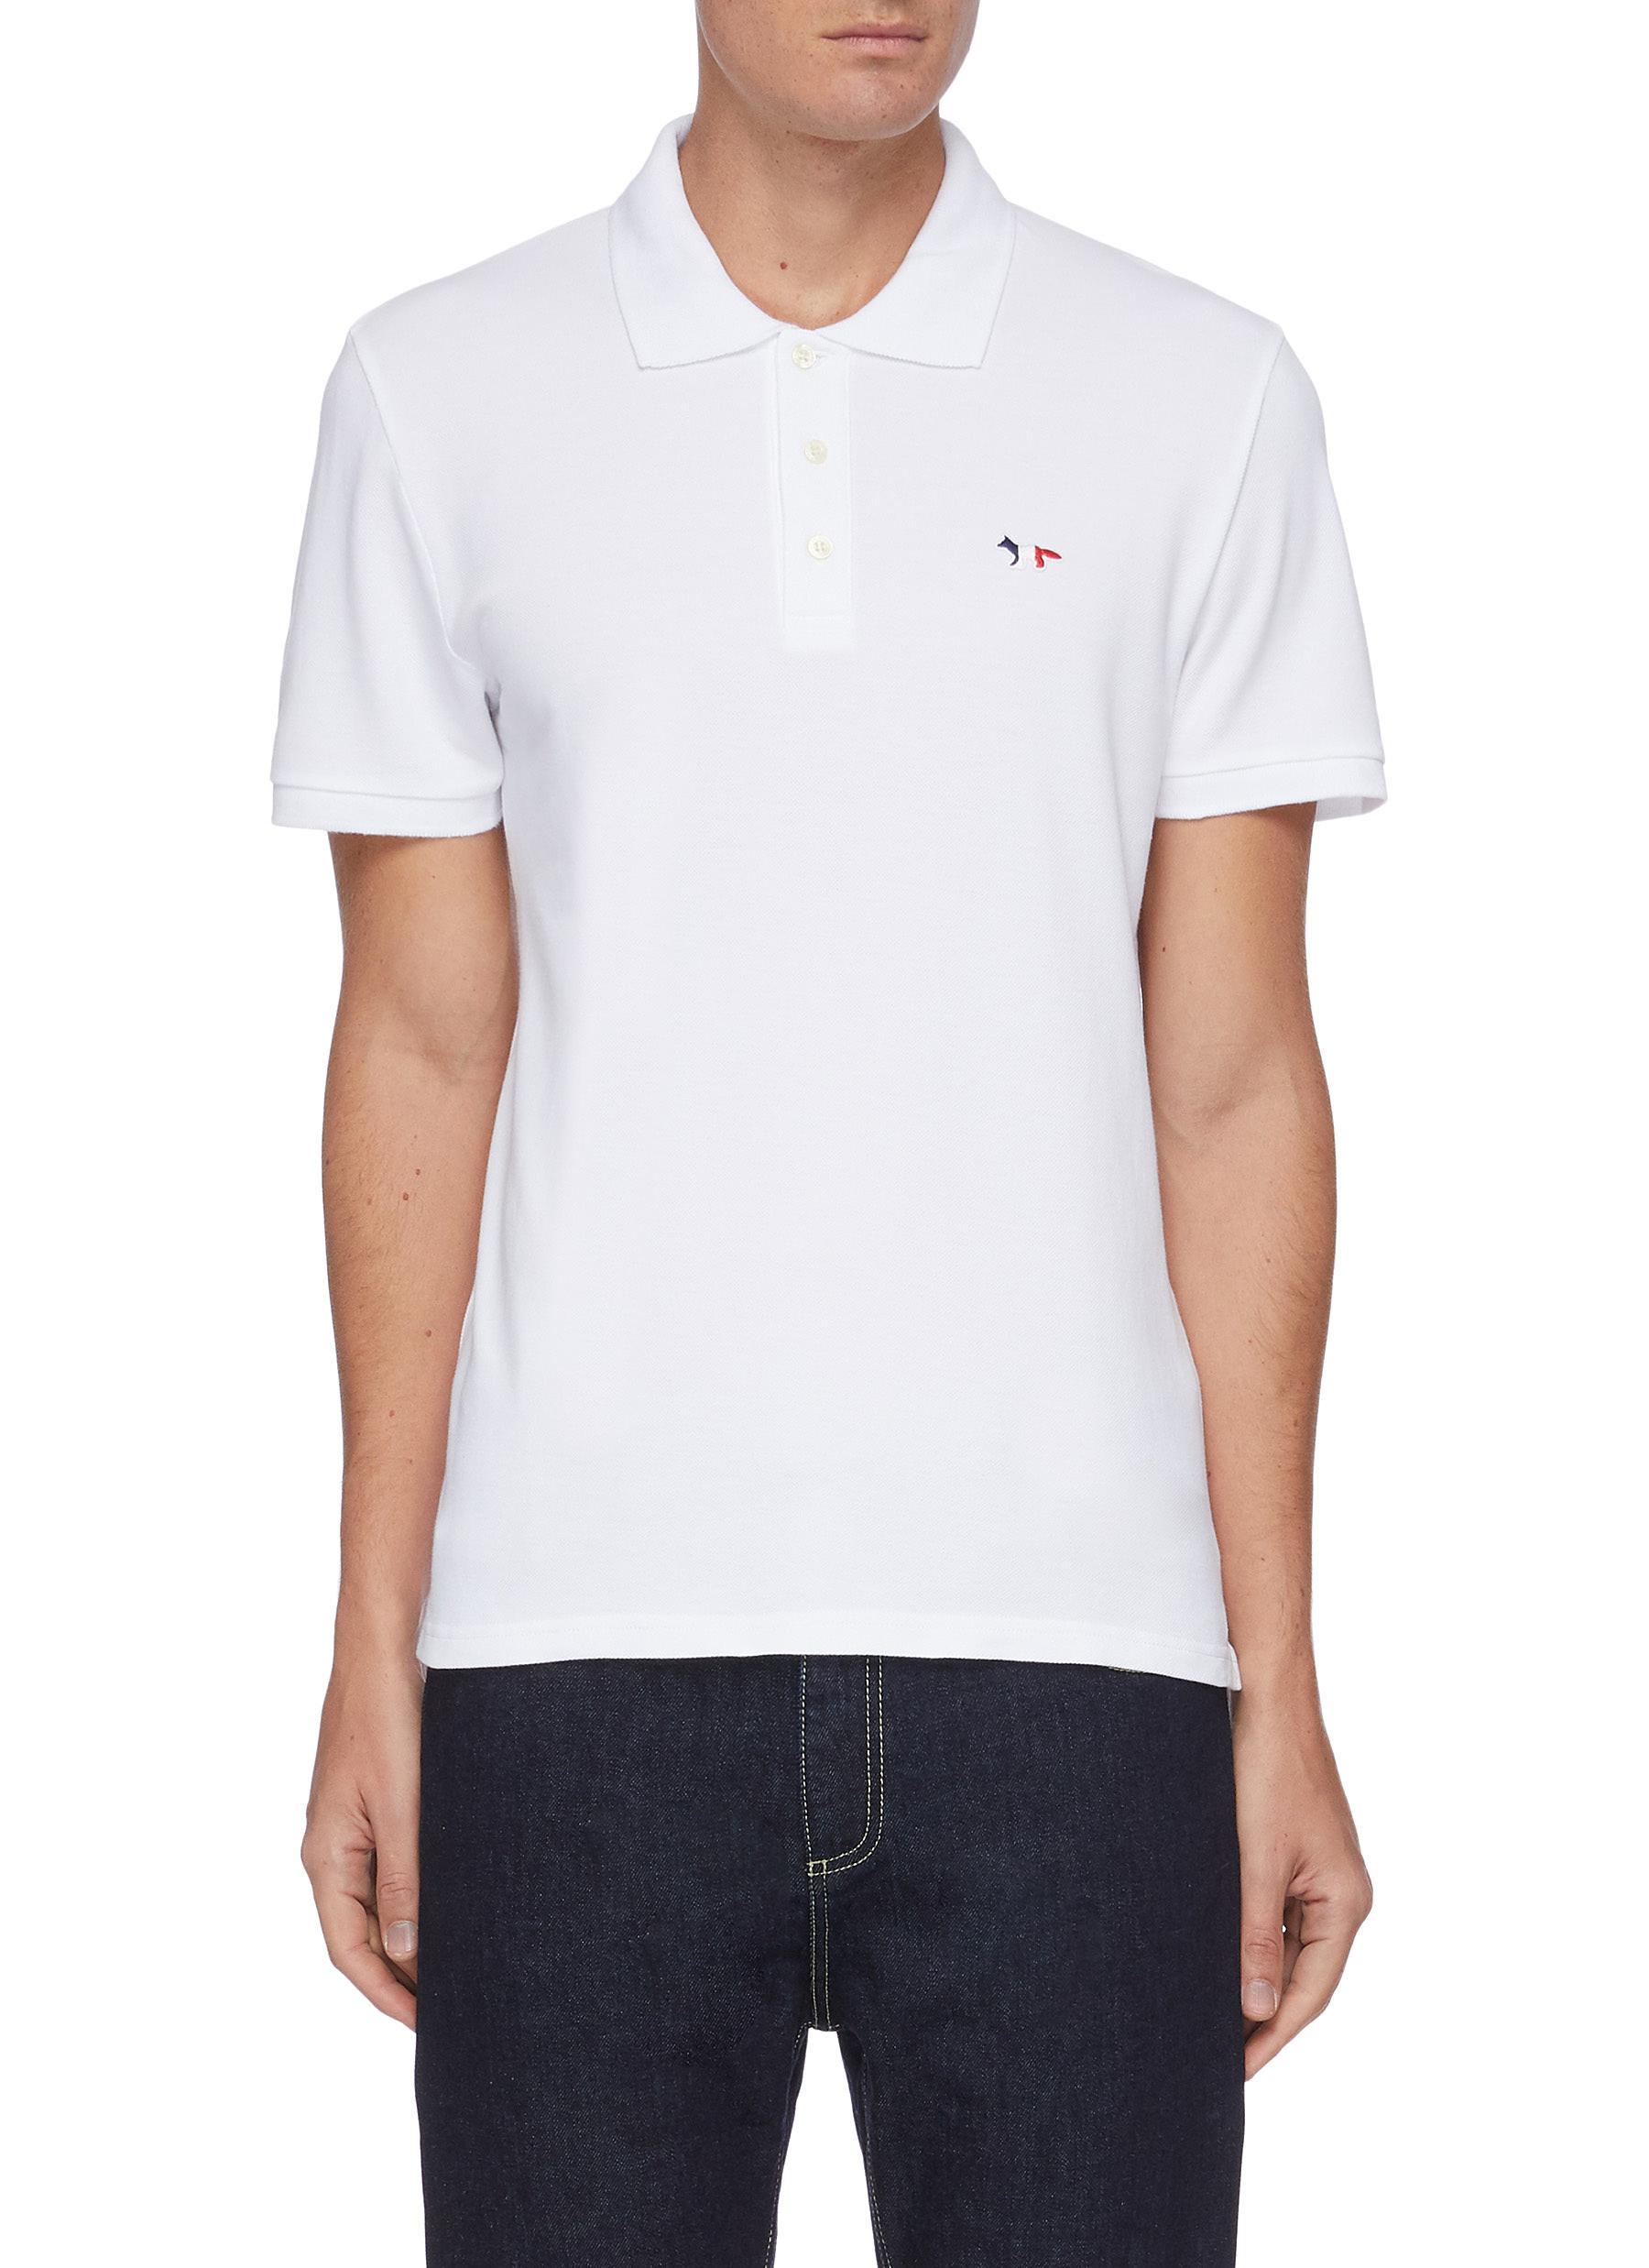 Tricolour Fox Patch Cotton Pique Polo Shirt - MAISON KITSUNÉ - Modalova